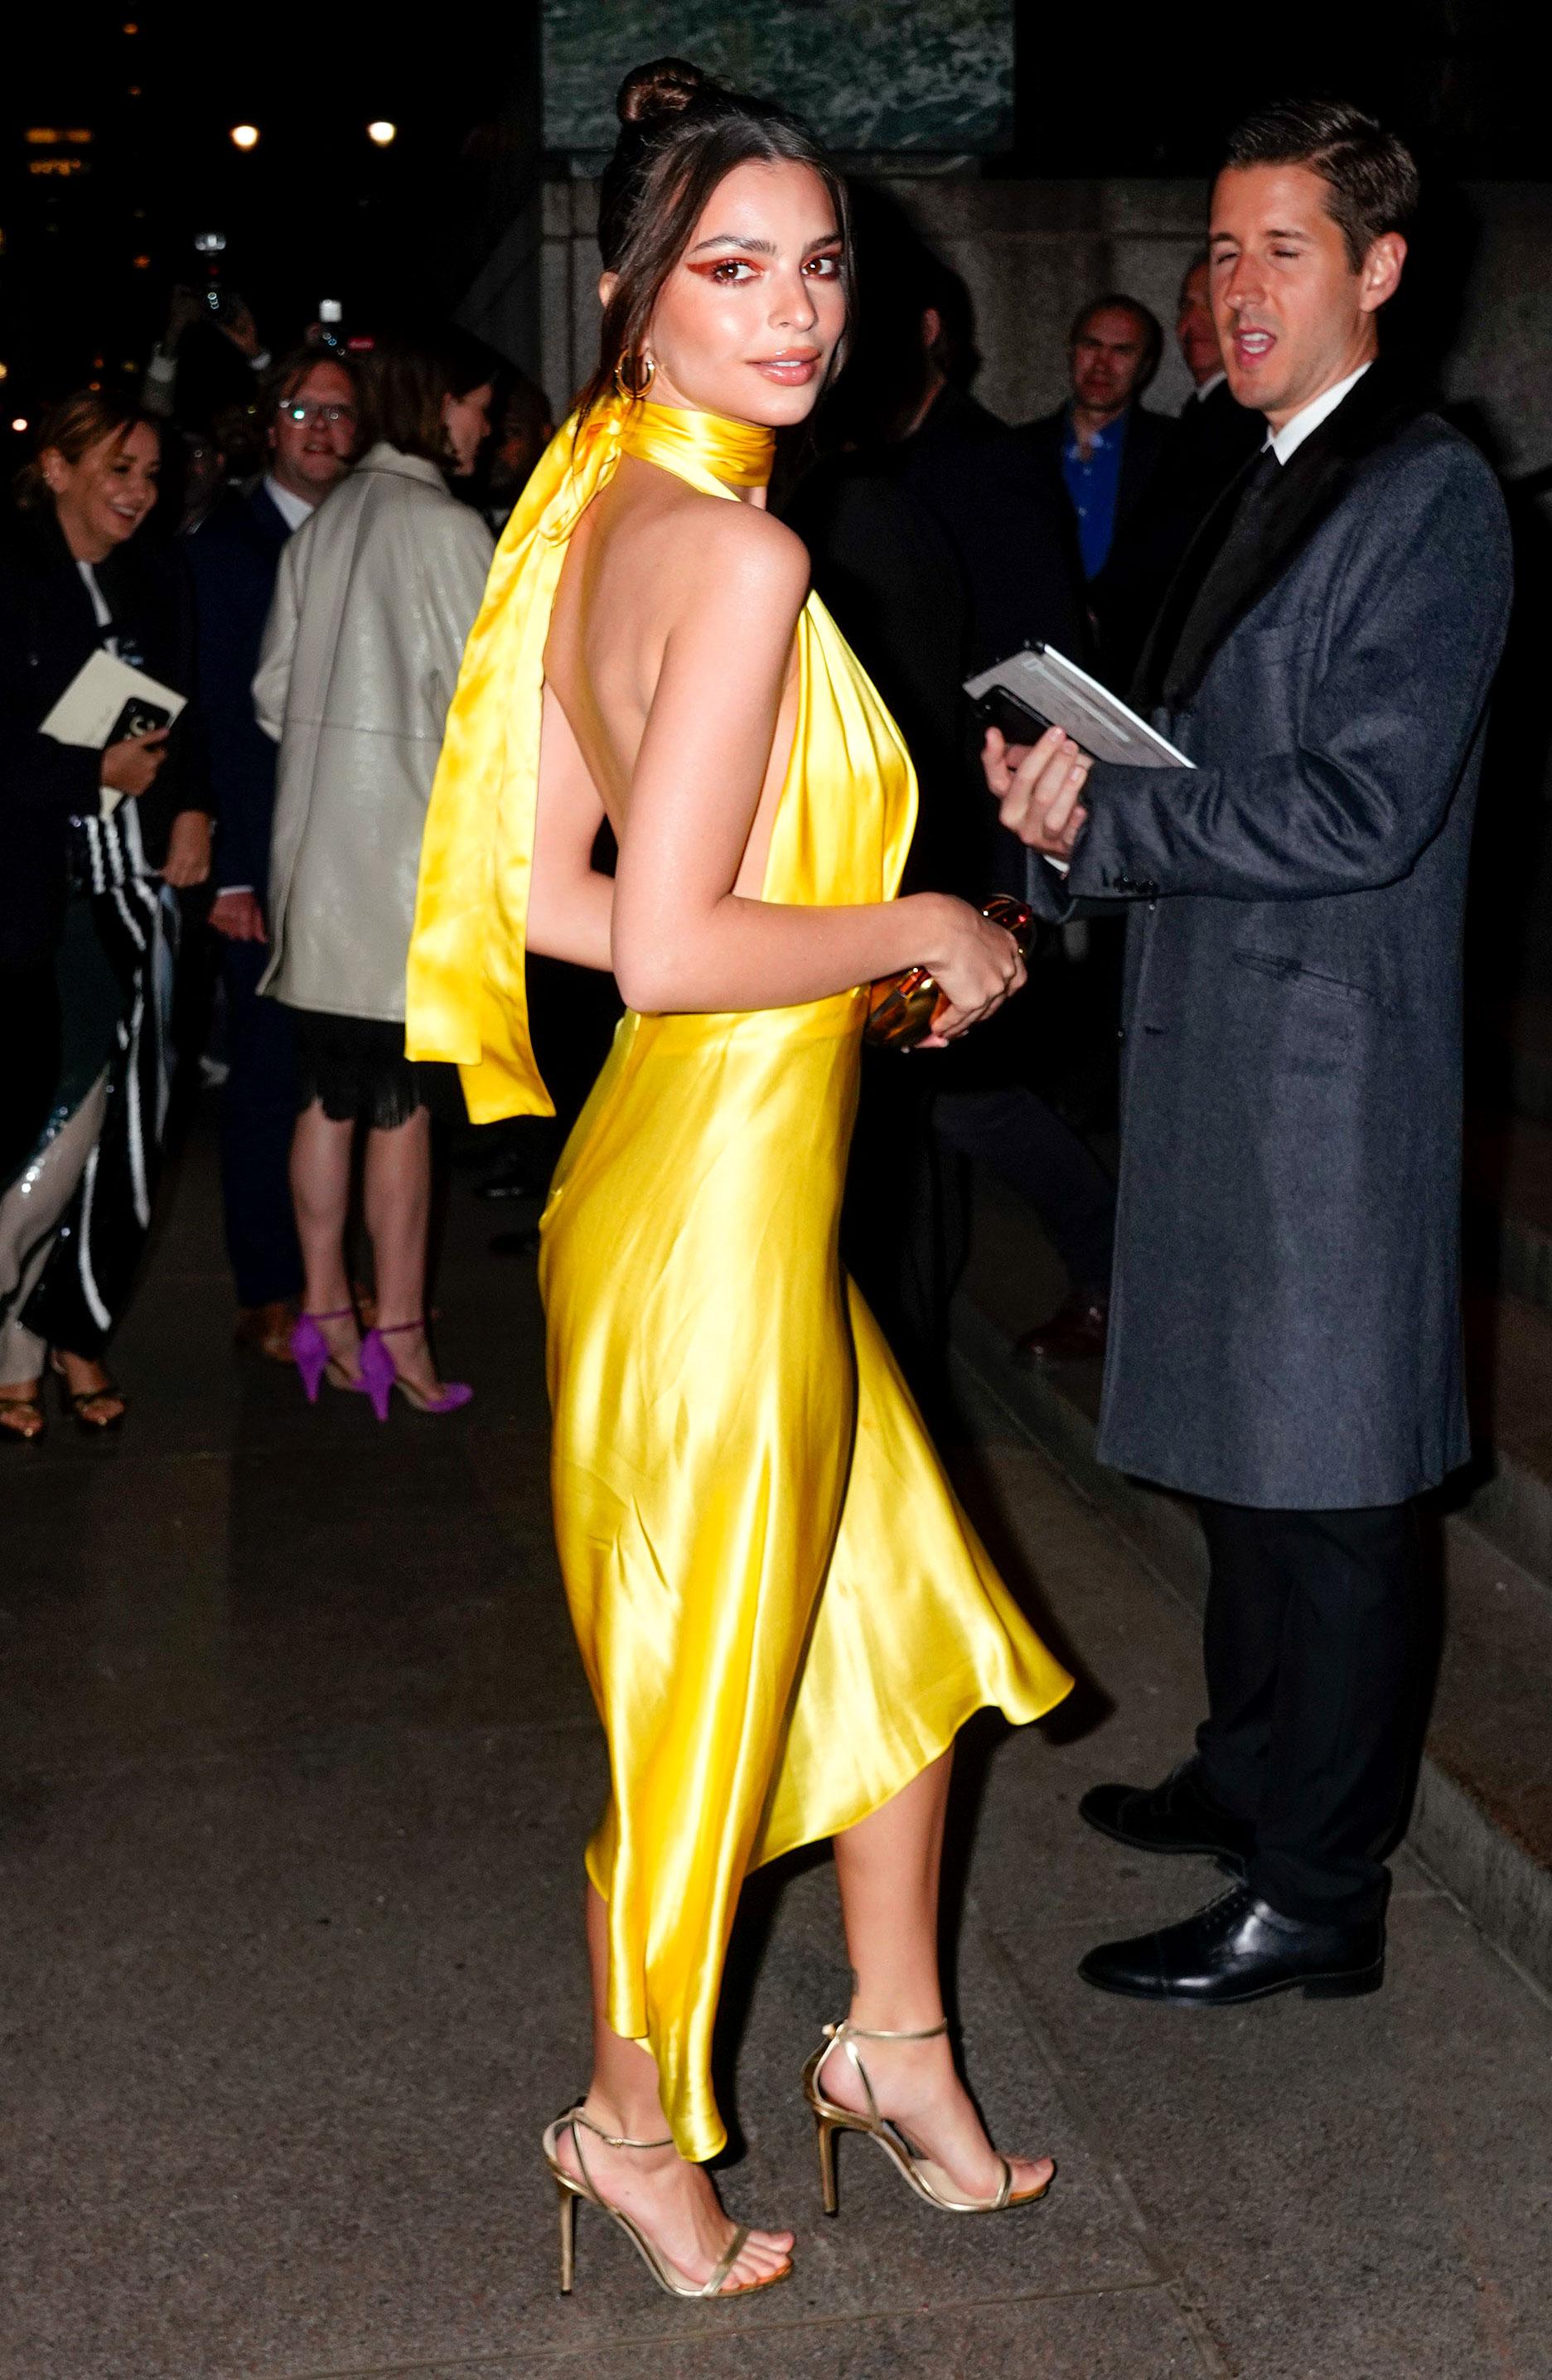 Marc-Jacob-and-Char-DeFrancesco-wedding-reception Emily Ratajkowski - Ratajkowski rocked a vibrant yellow dress for the occasion.